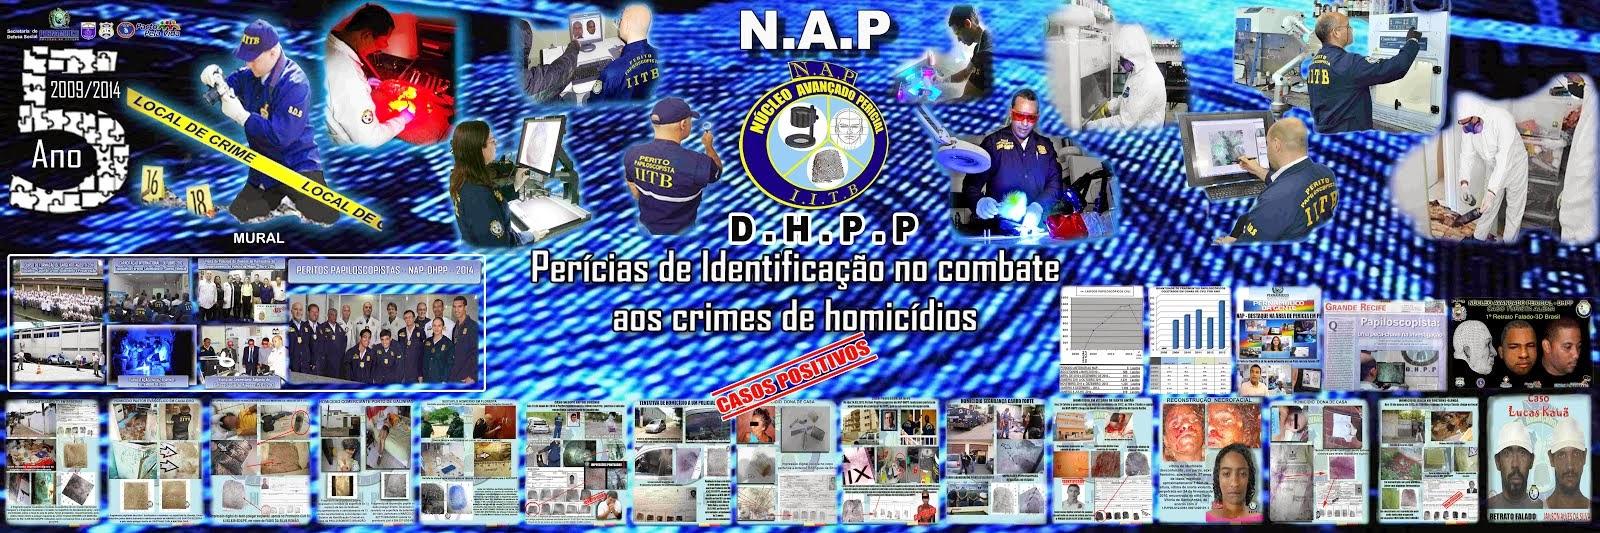 NAP/IITB/DHPP